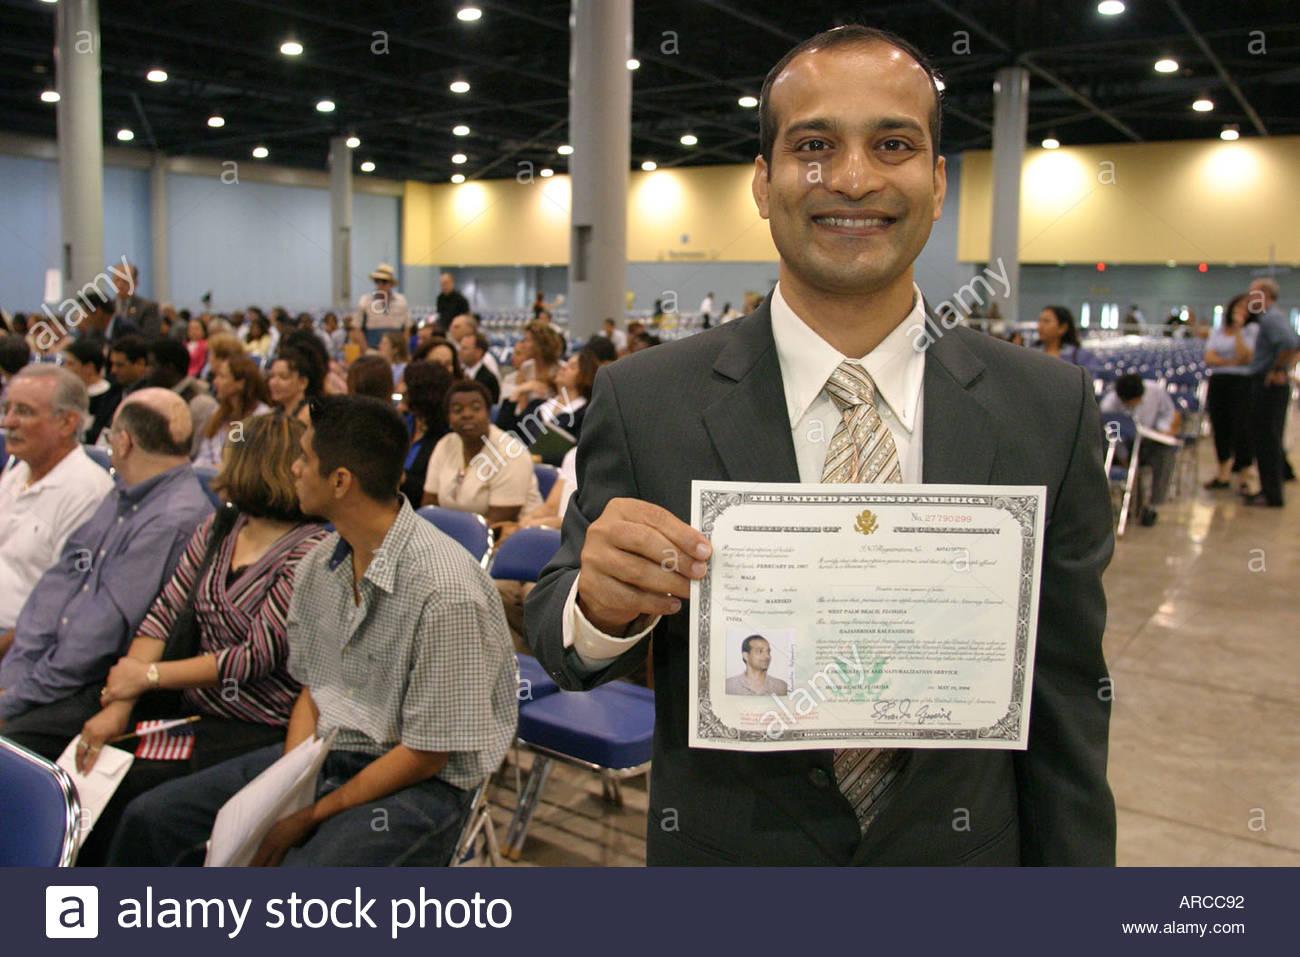 Miami beach florida naturalization ceremony oath of citizenship miami beach florida naturalization ceremony oath of citizenship pledge of allegiance certificate of naturalization 1betcityfo Choice Image